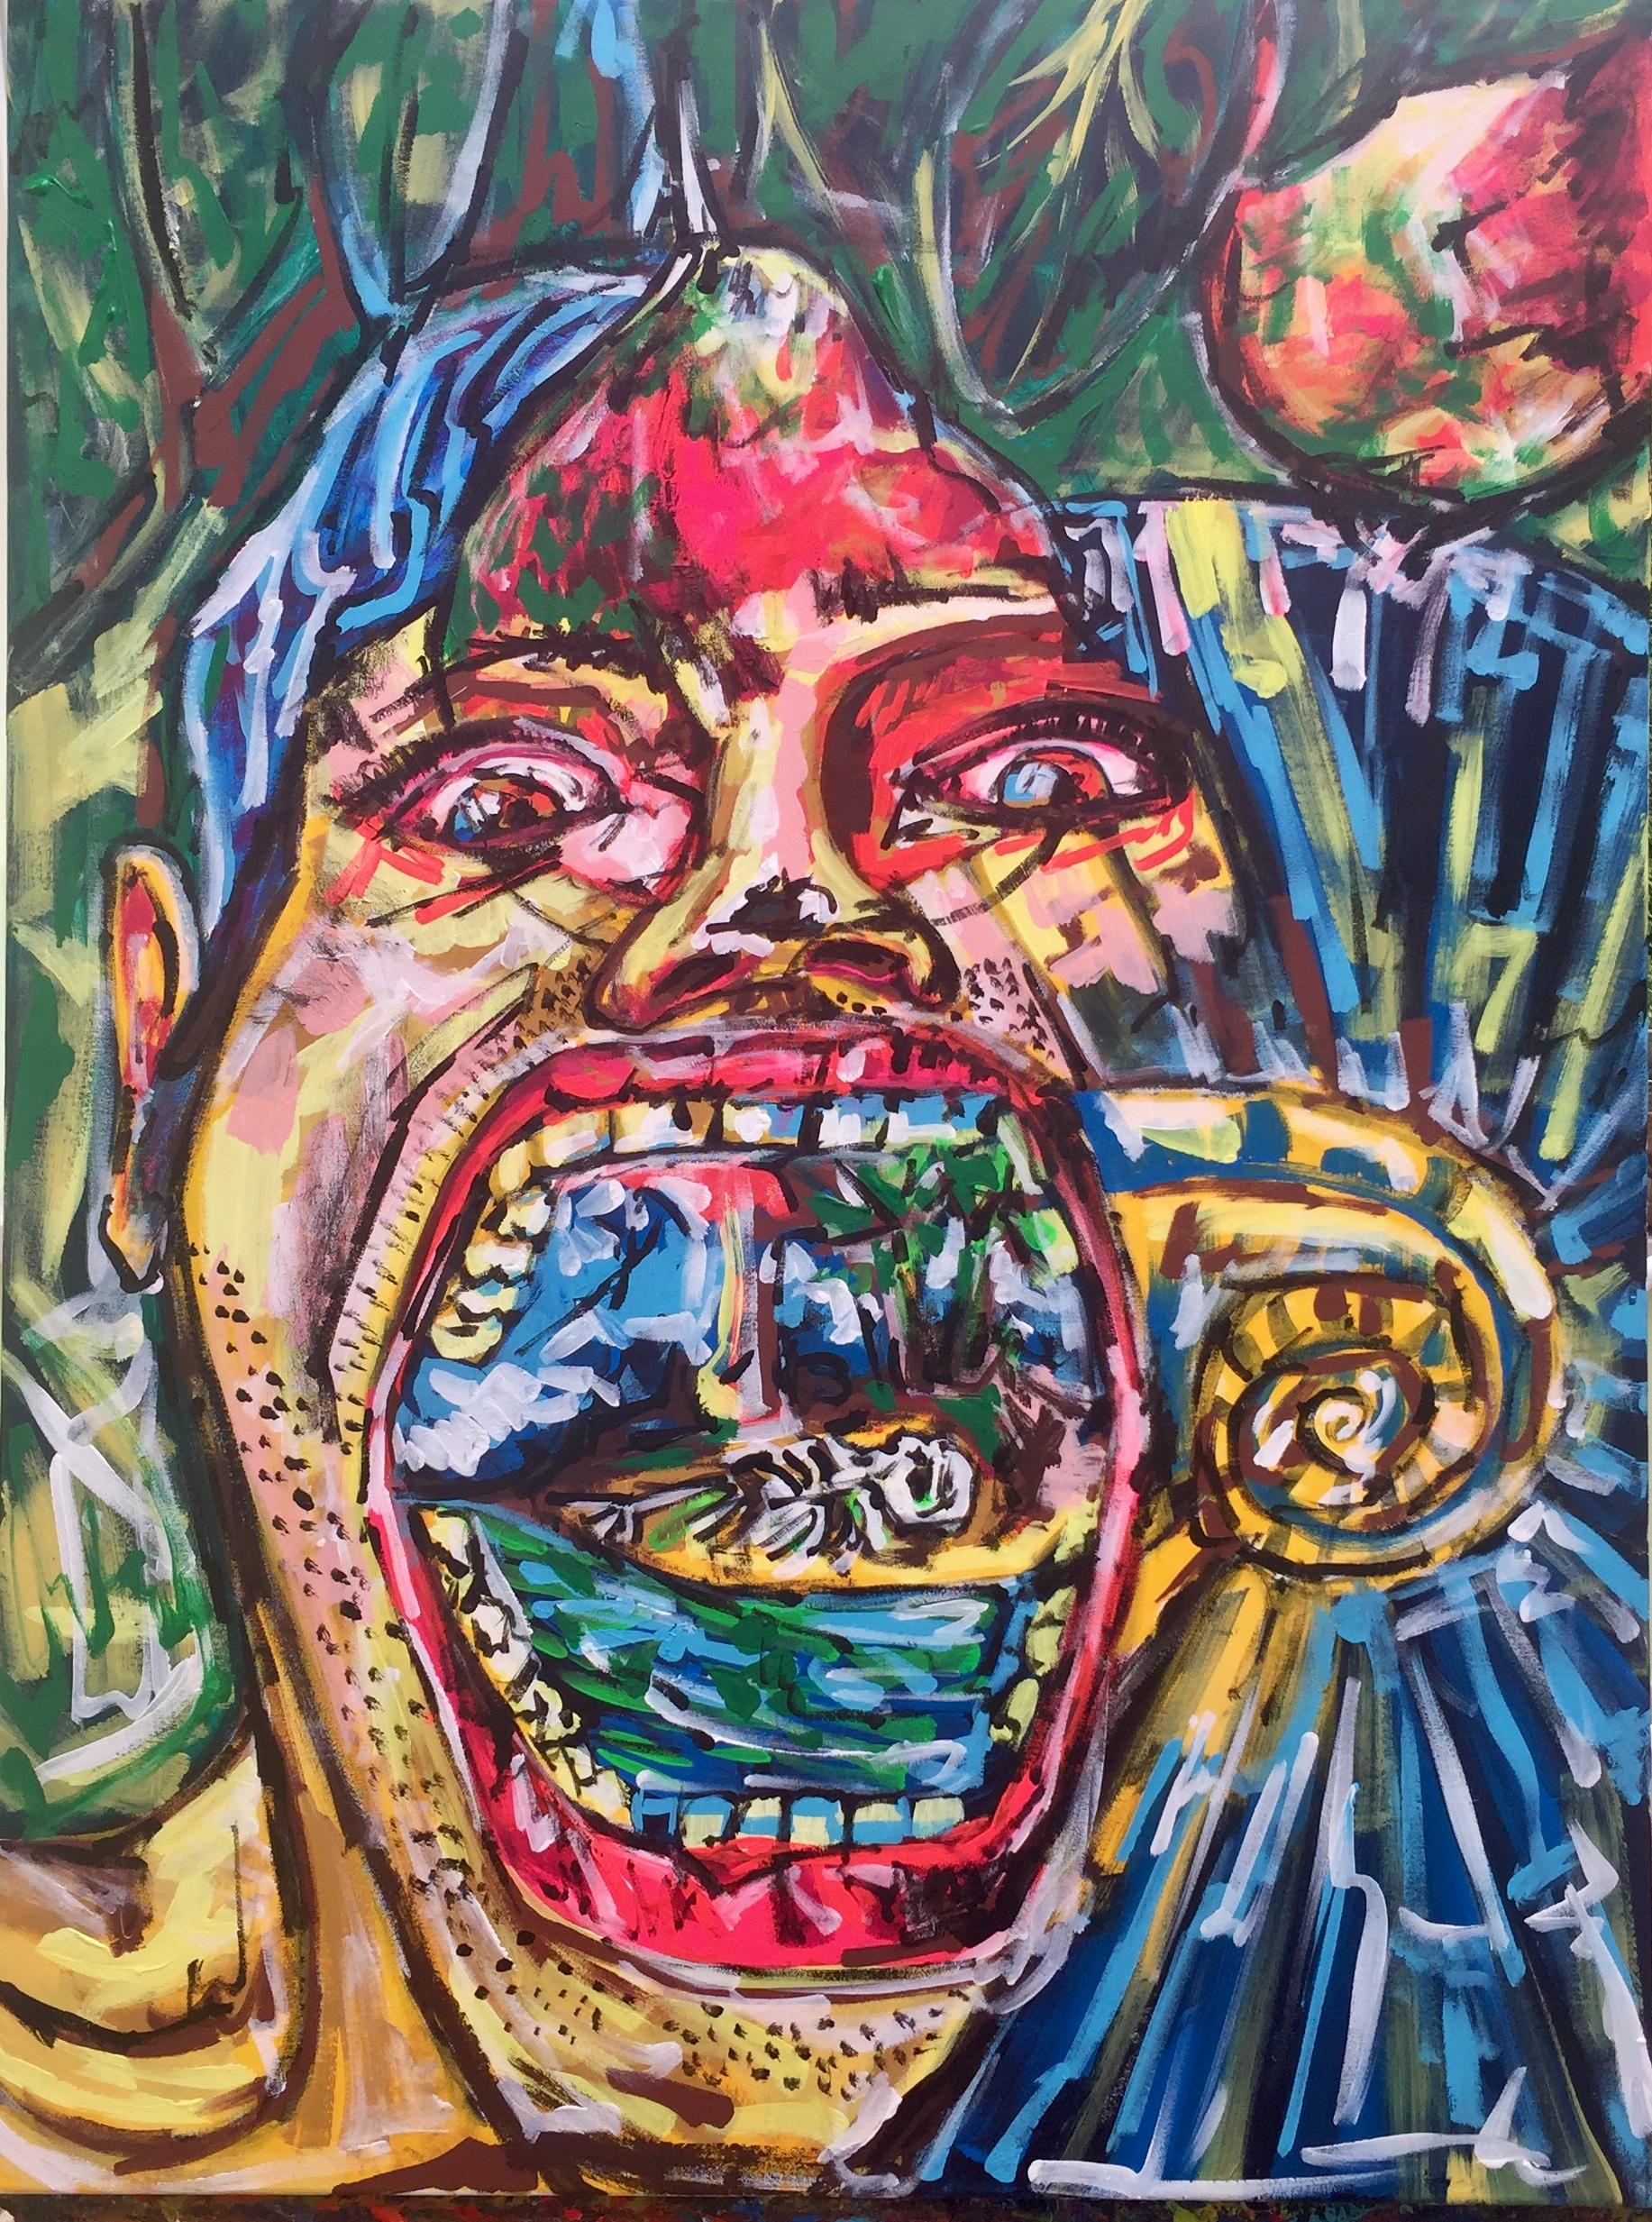 quadri astratti moderni dipinti